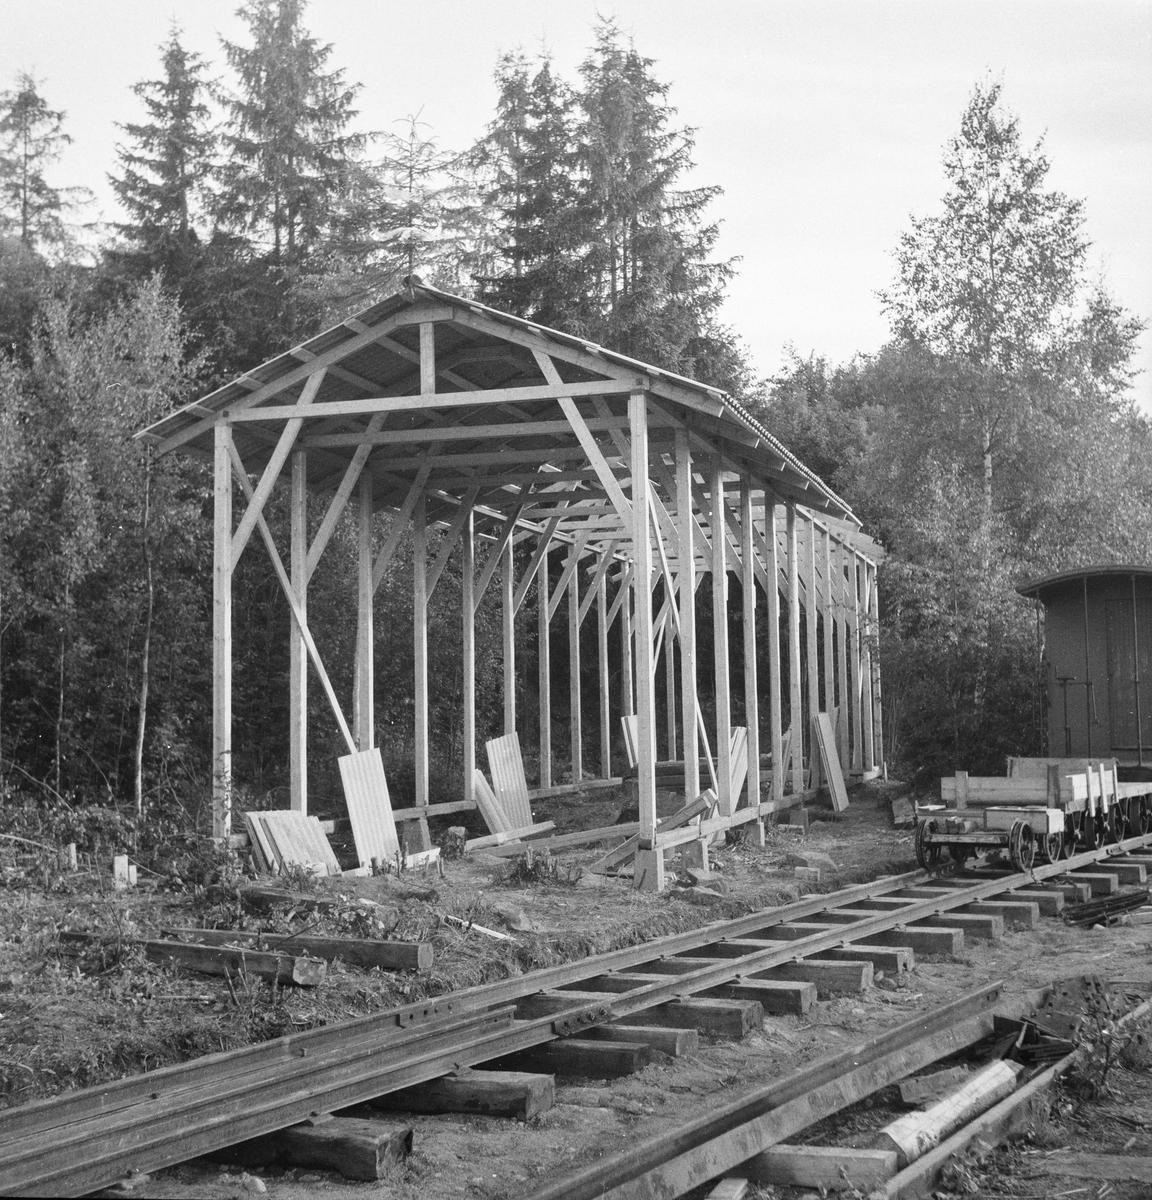 Bingsfoss var hovedbase for museumsbanen de første årene. Her er lokomotivstallen under oppføring.